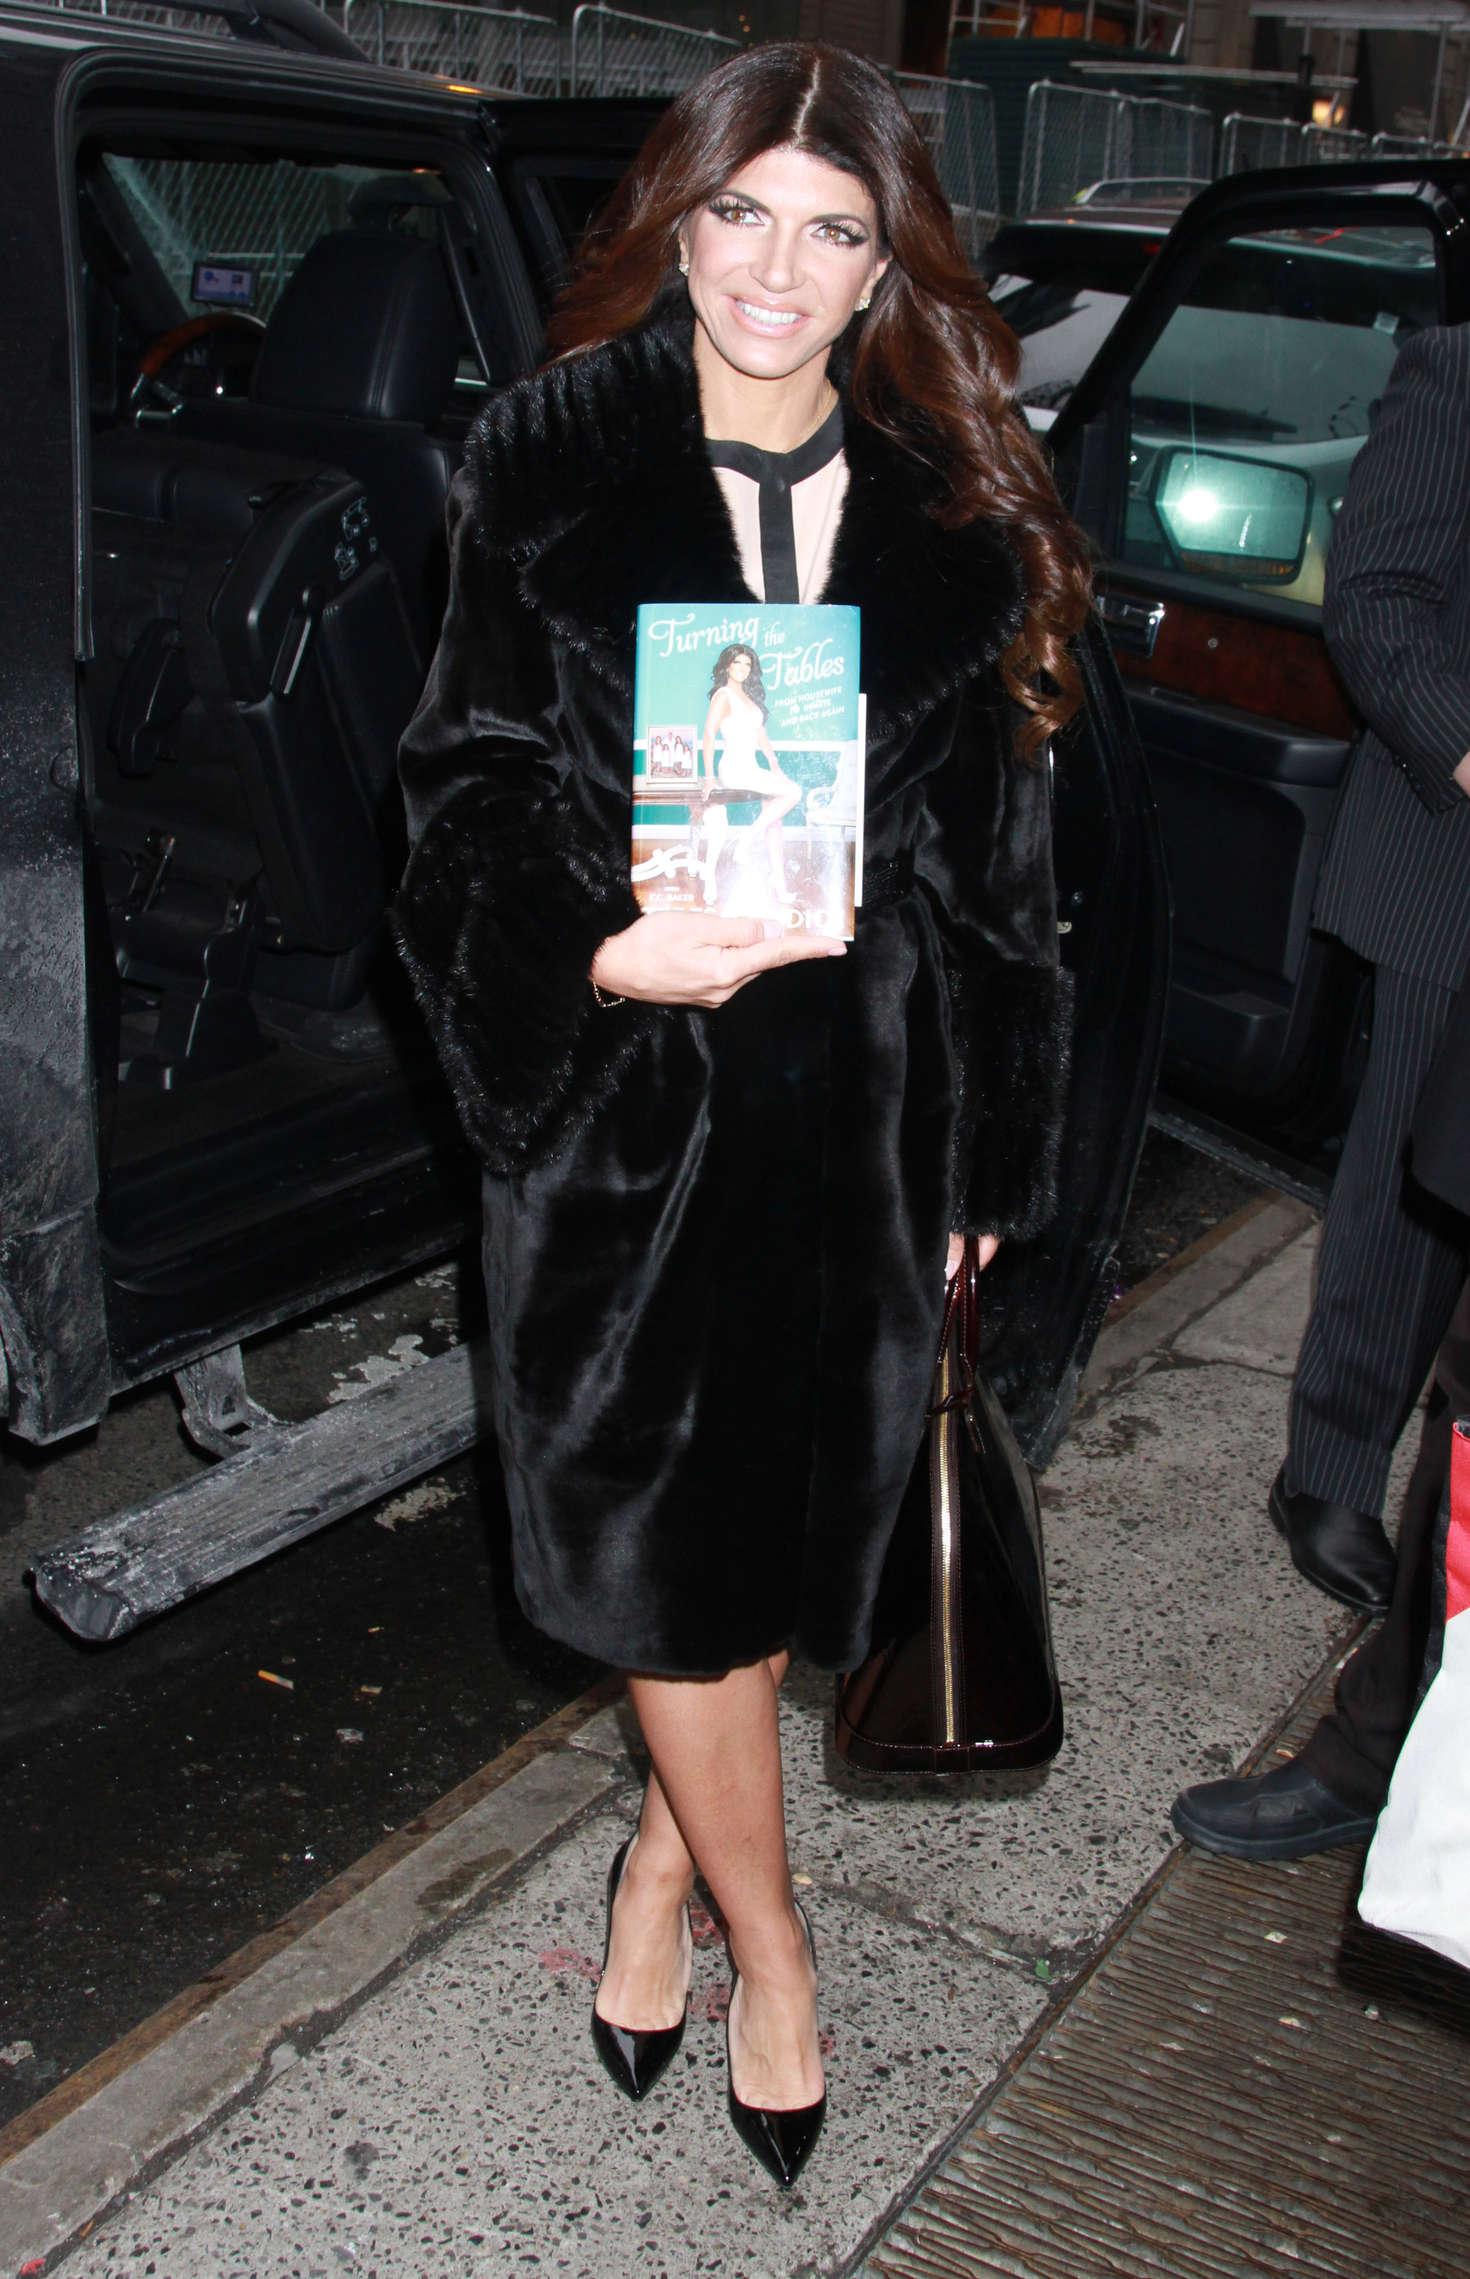 Teresa Giudice at ABC Studios in New York City